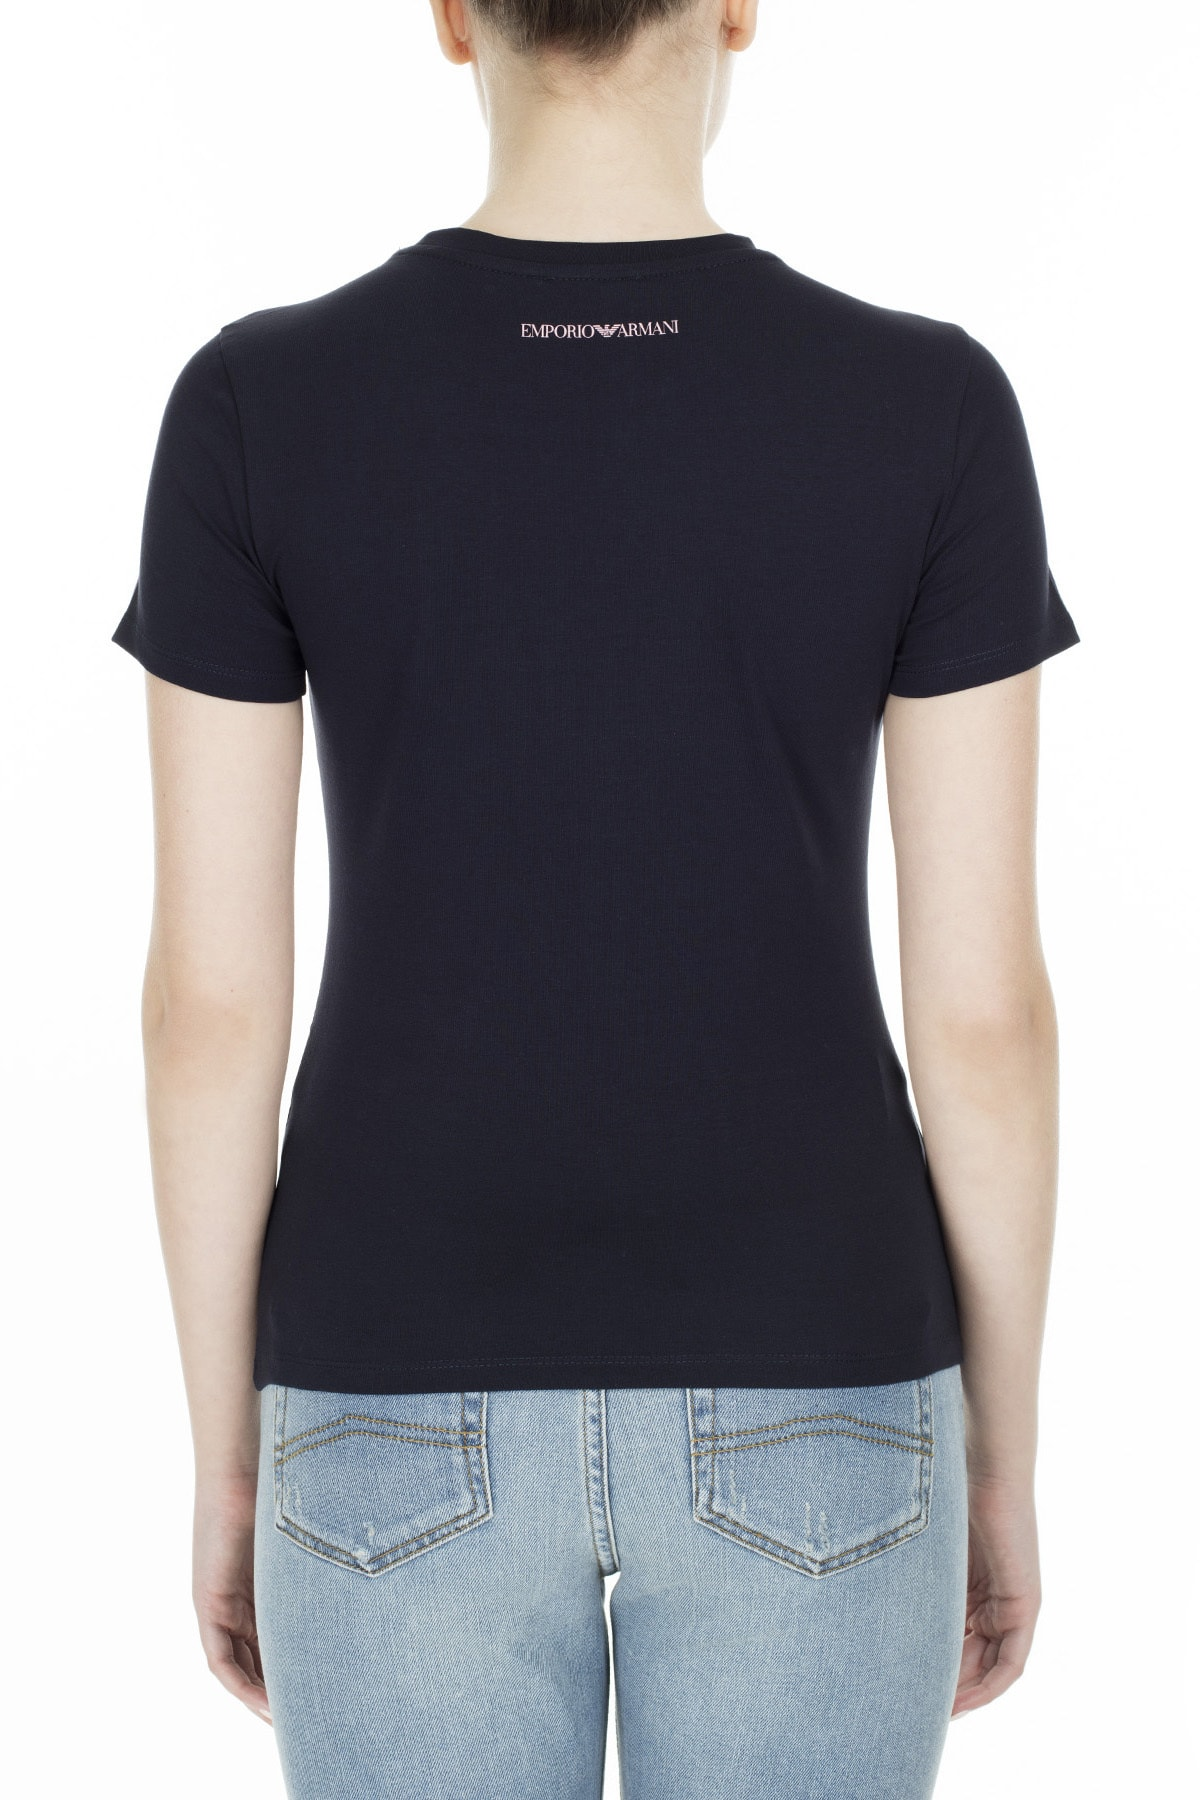 Emporio Armani T Shirt Kadın T Shirt S 6G2T7N 2J07Z 0927 S 6G2T7N 2J07Z 0927 1